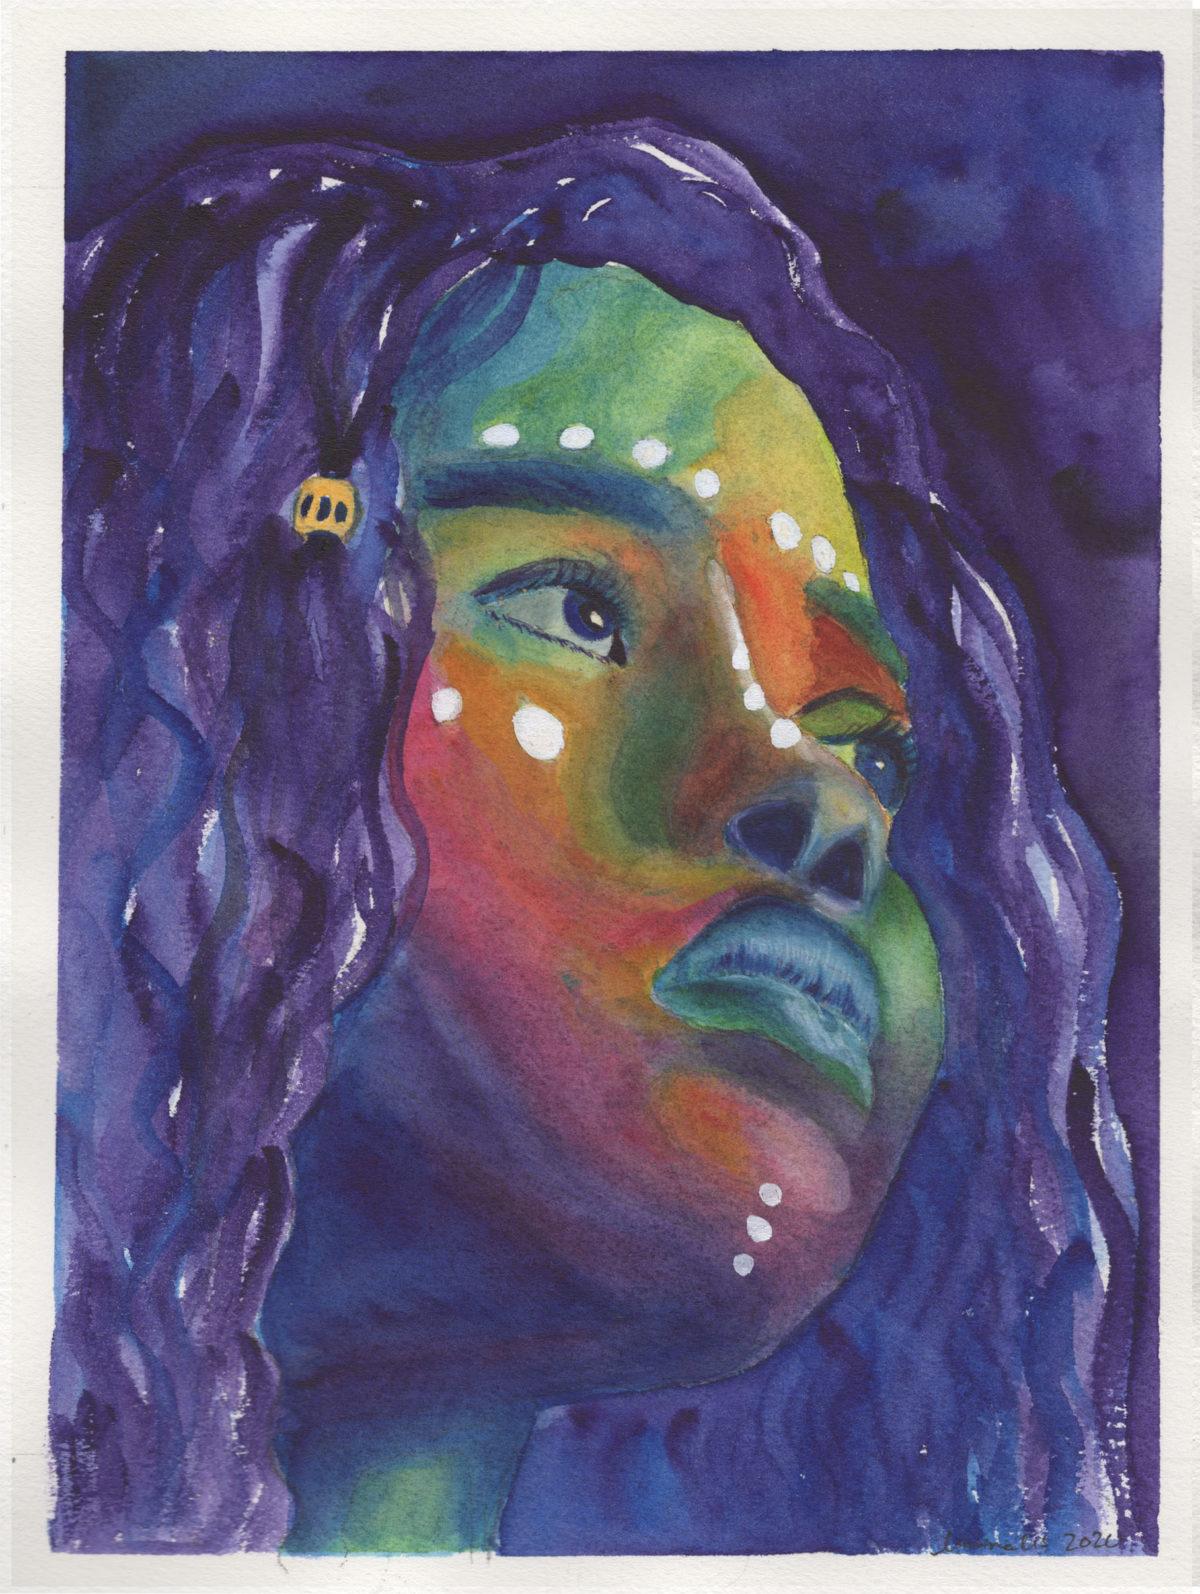 Untitled Rainbow Portrait